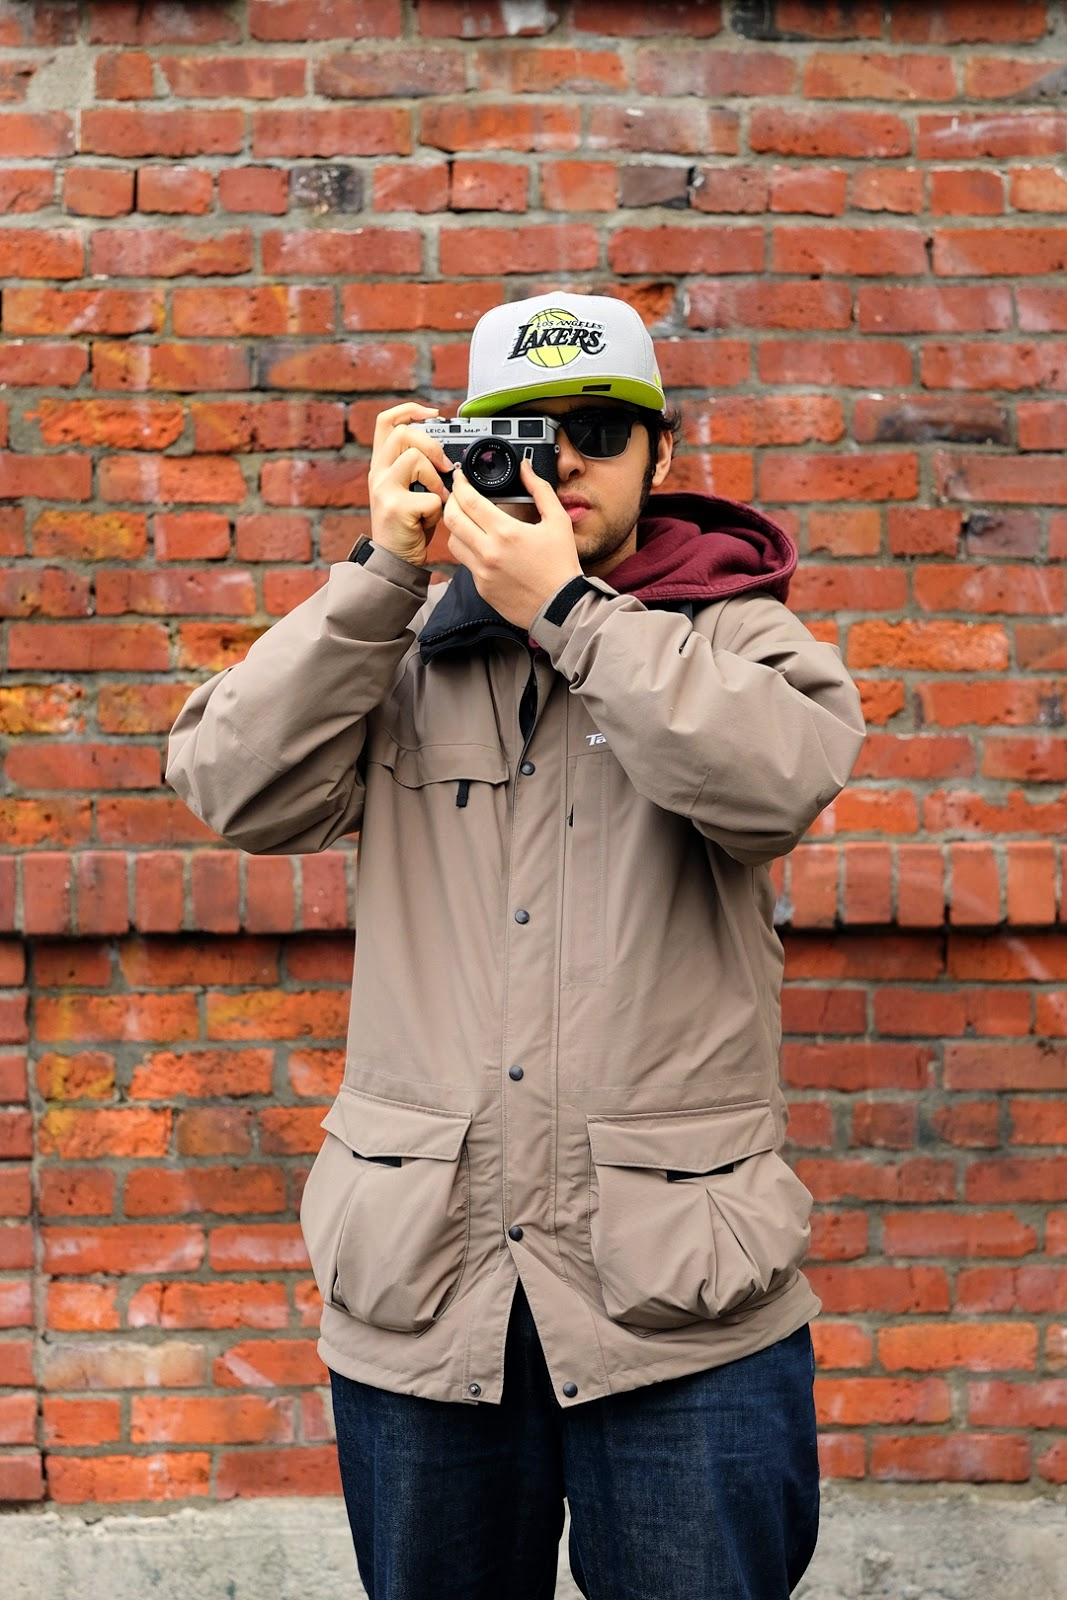 Lens Review Fujifilm Xf56mm F 12 R Apd X T2 Body Only Xf 56mm F12 1 350th Sec 36 Iso 800 Provia Jpeg Amir Street Photographer